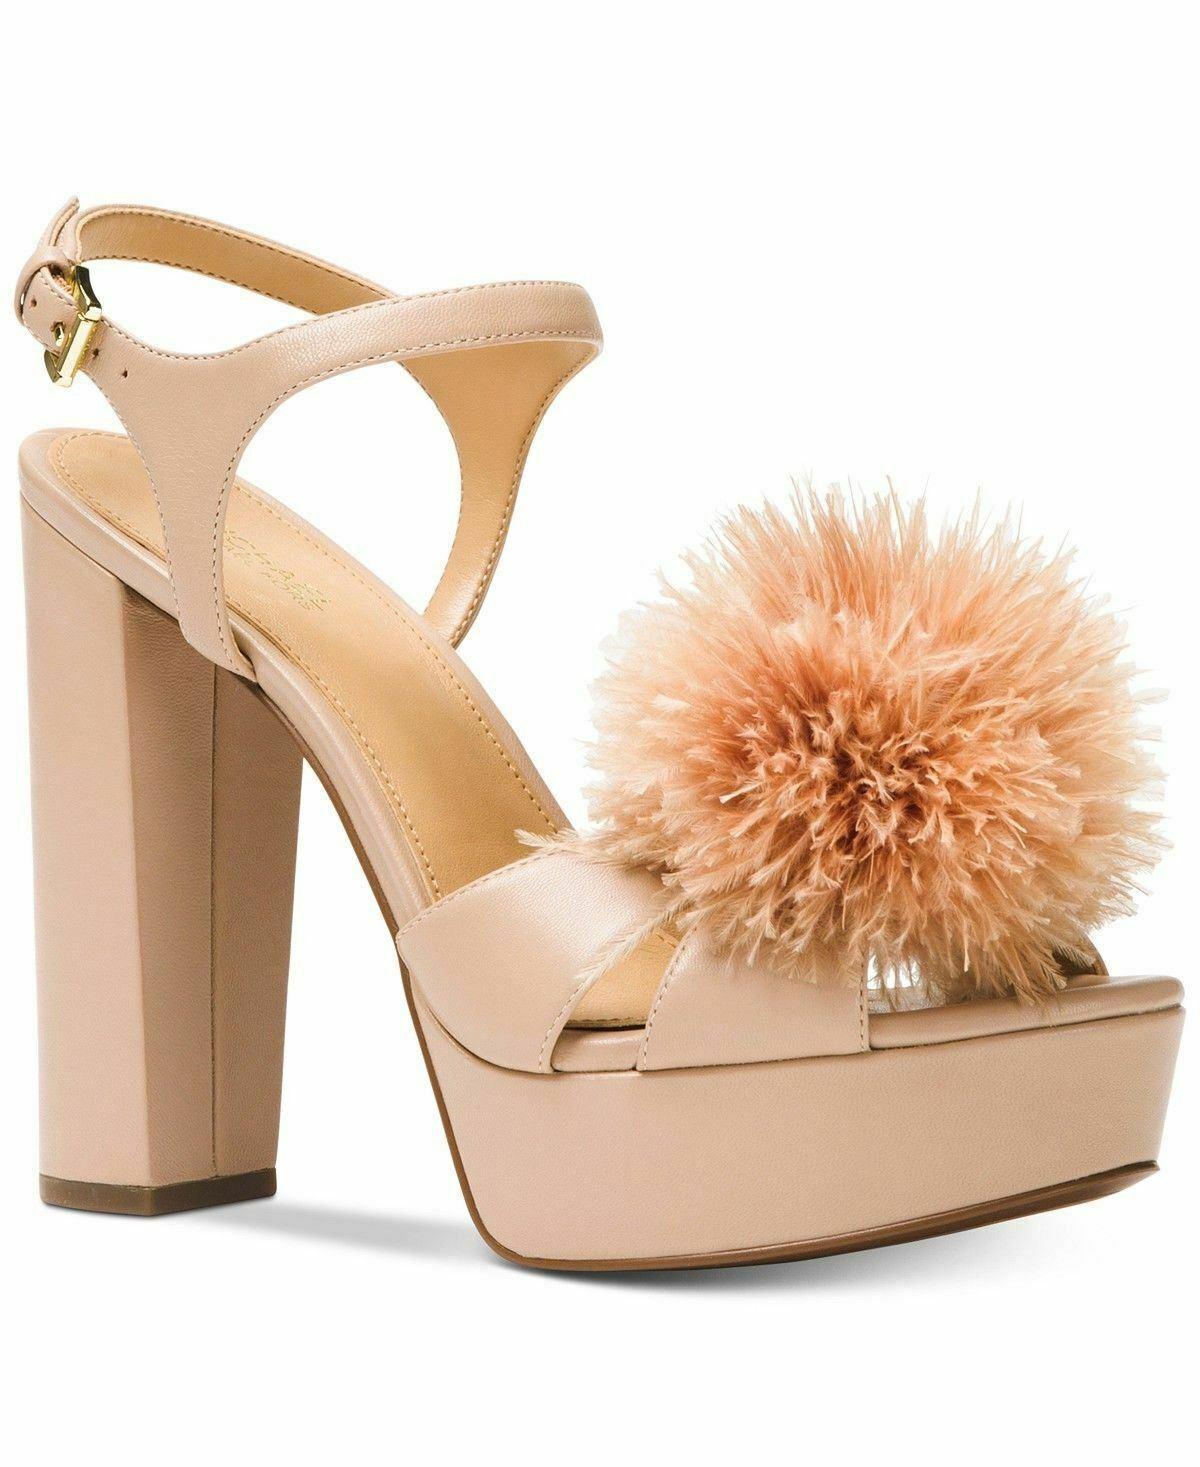 MICHAEL Michael Kors womens Fara Platform Sandals size 9M Color Oyster heels NWB image 5